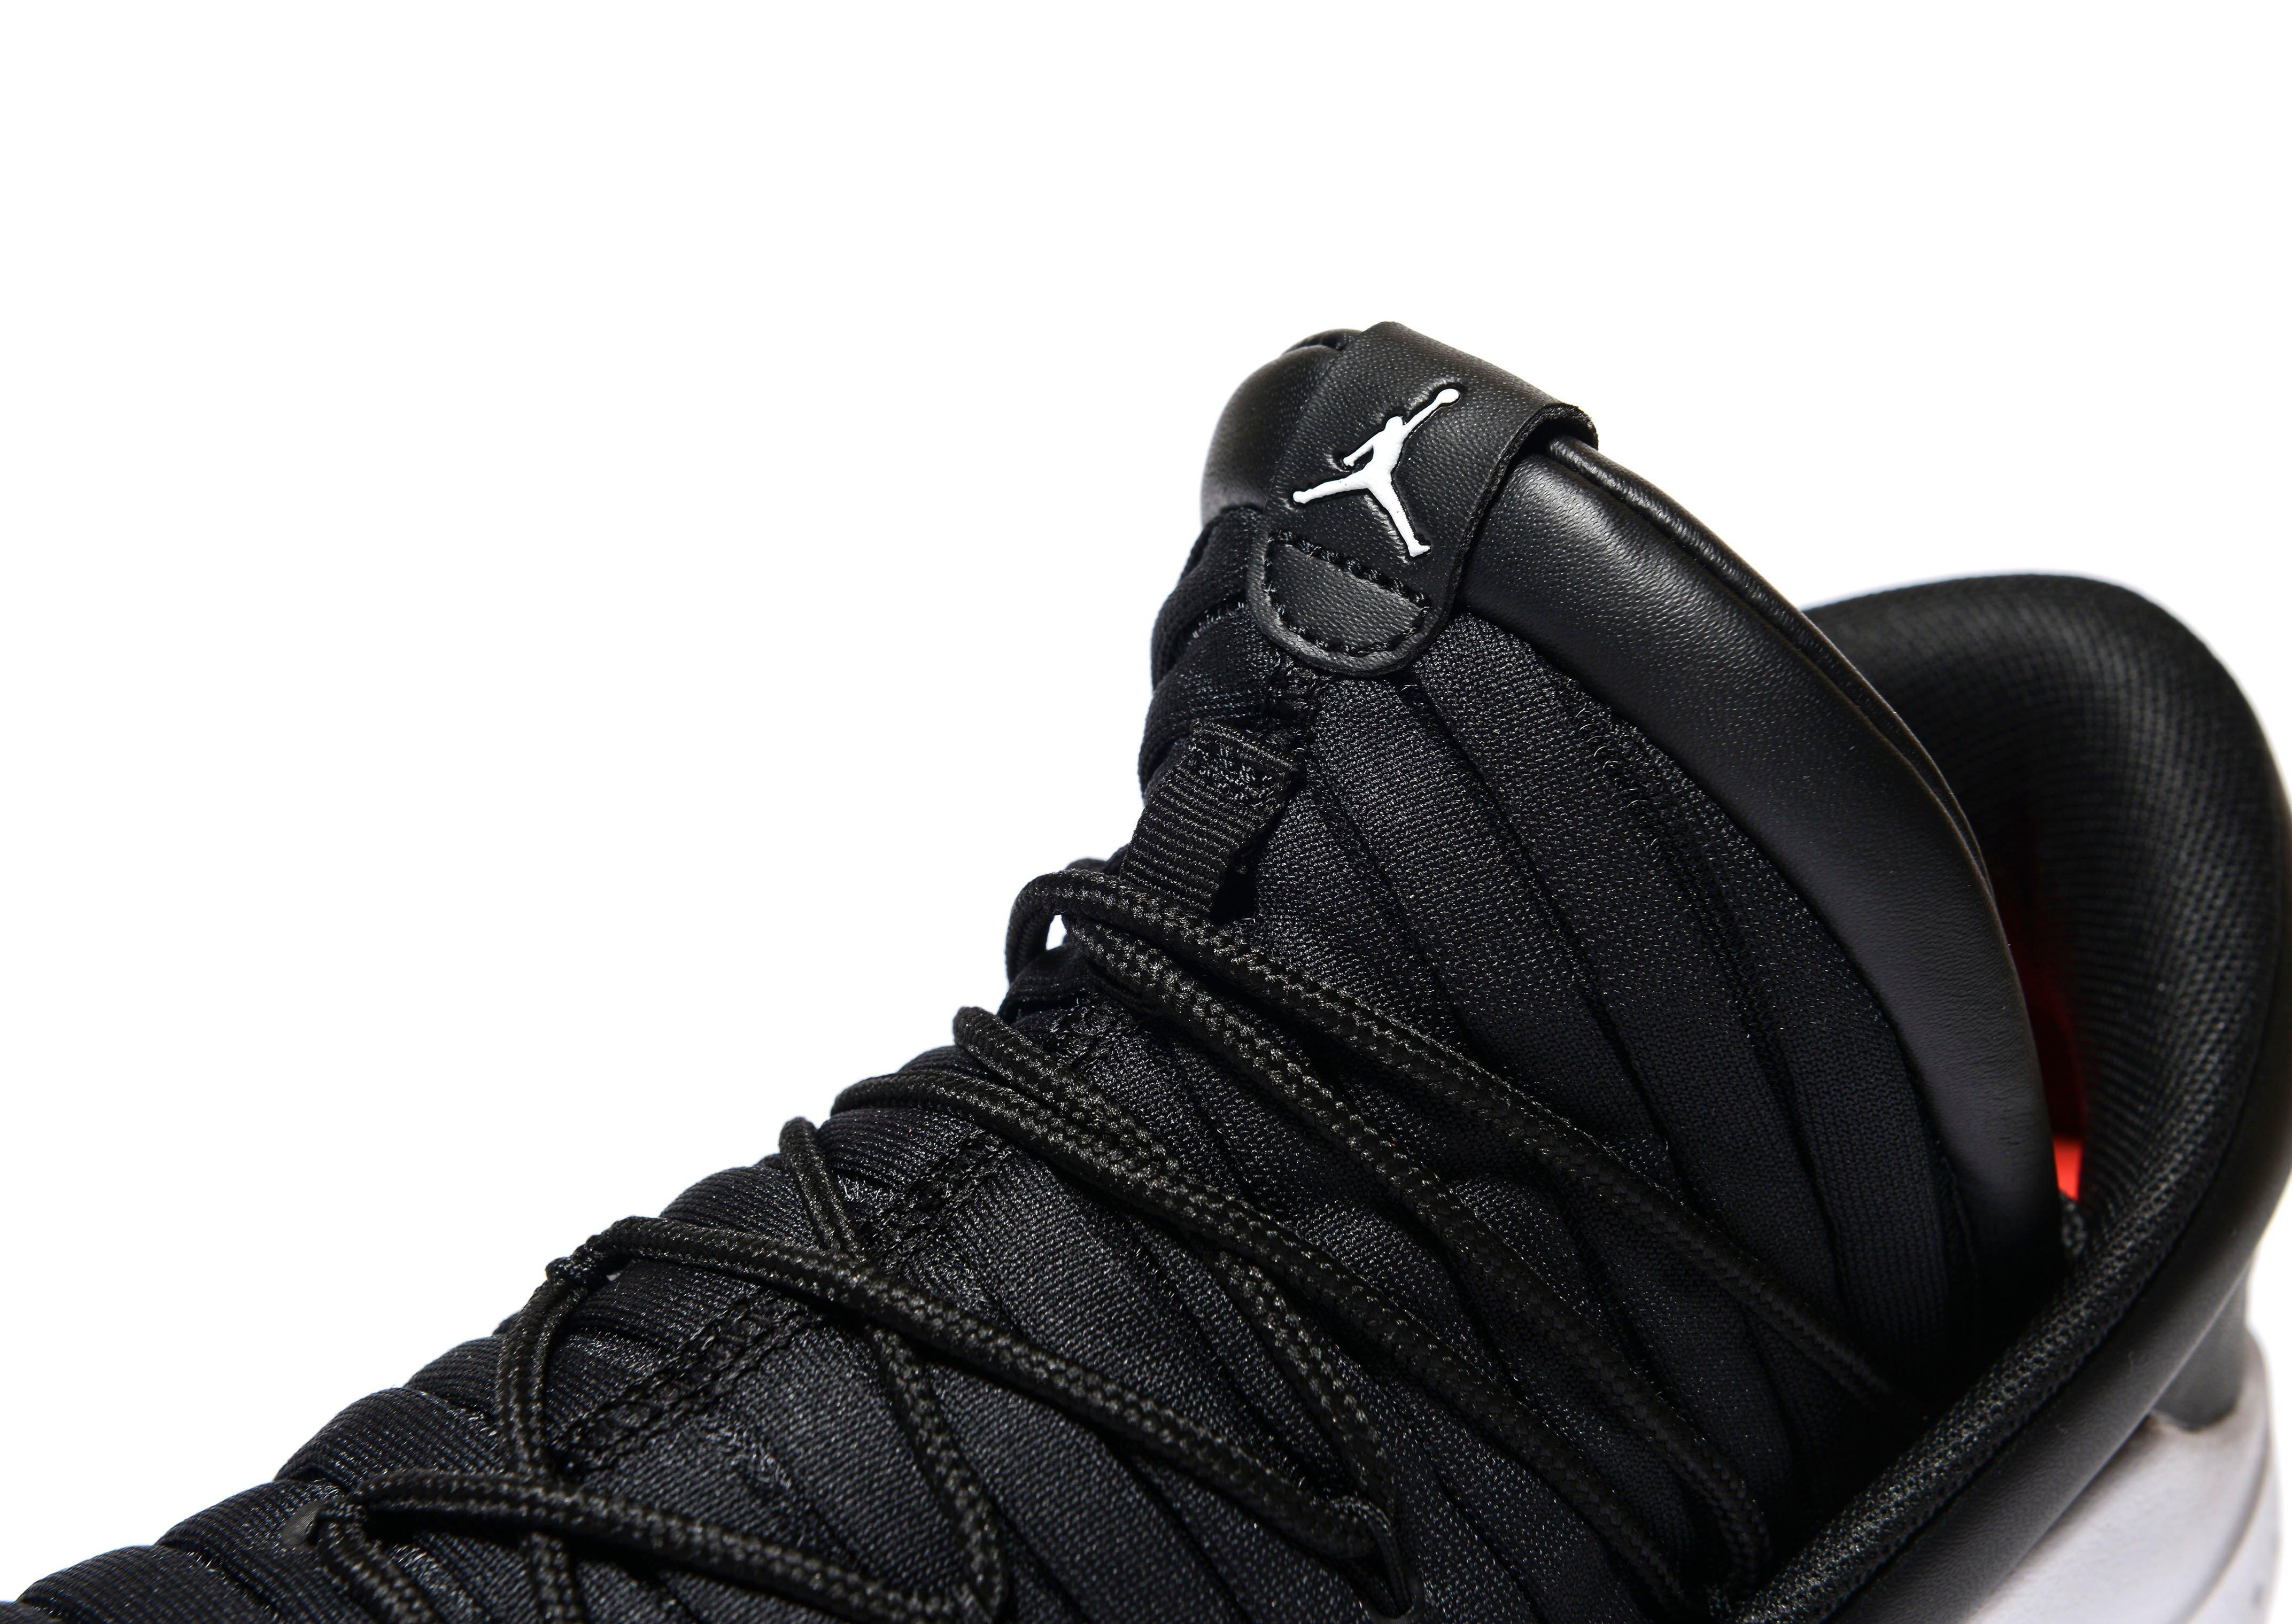 00f0079e3d15 Lyst - Nike Air Jordan Flight Flex in Black for Men